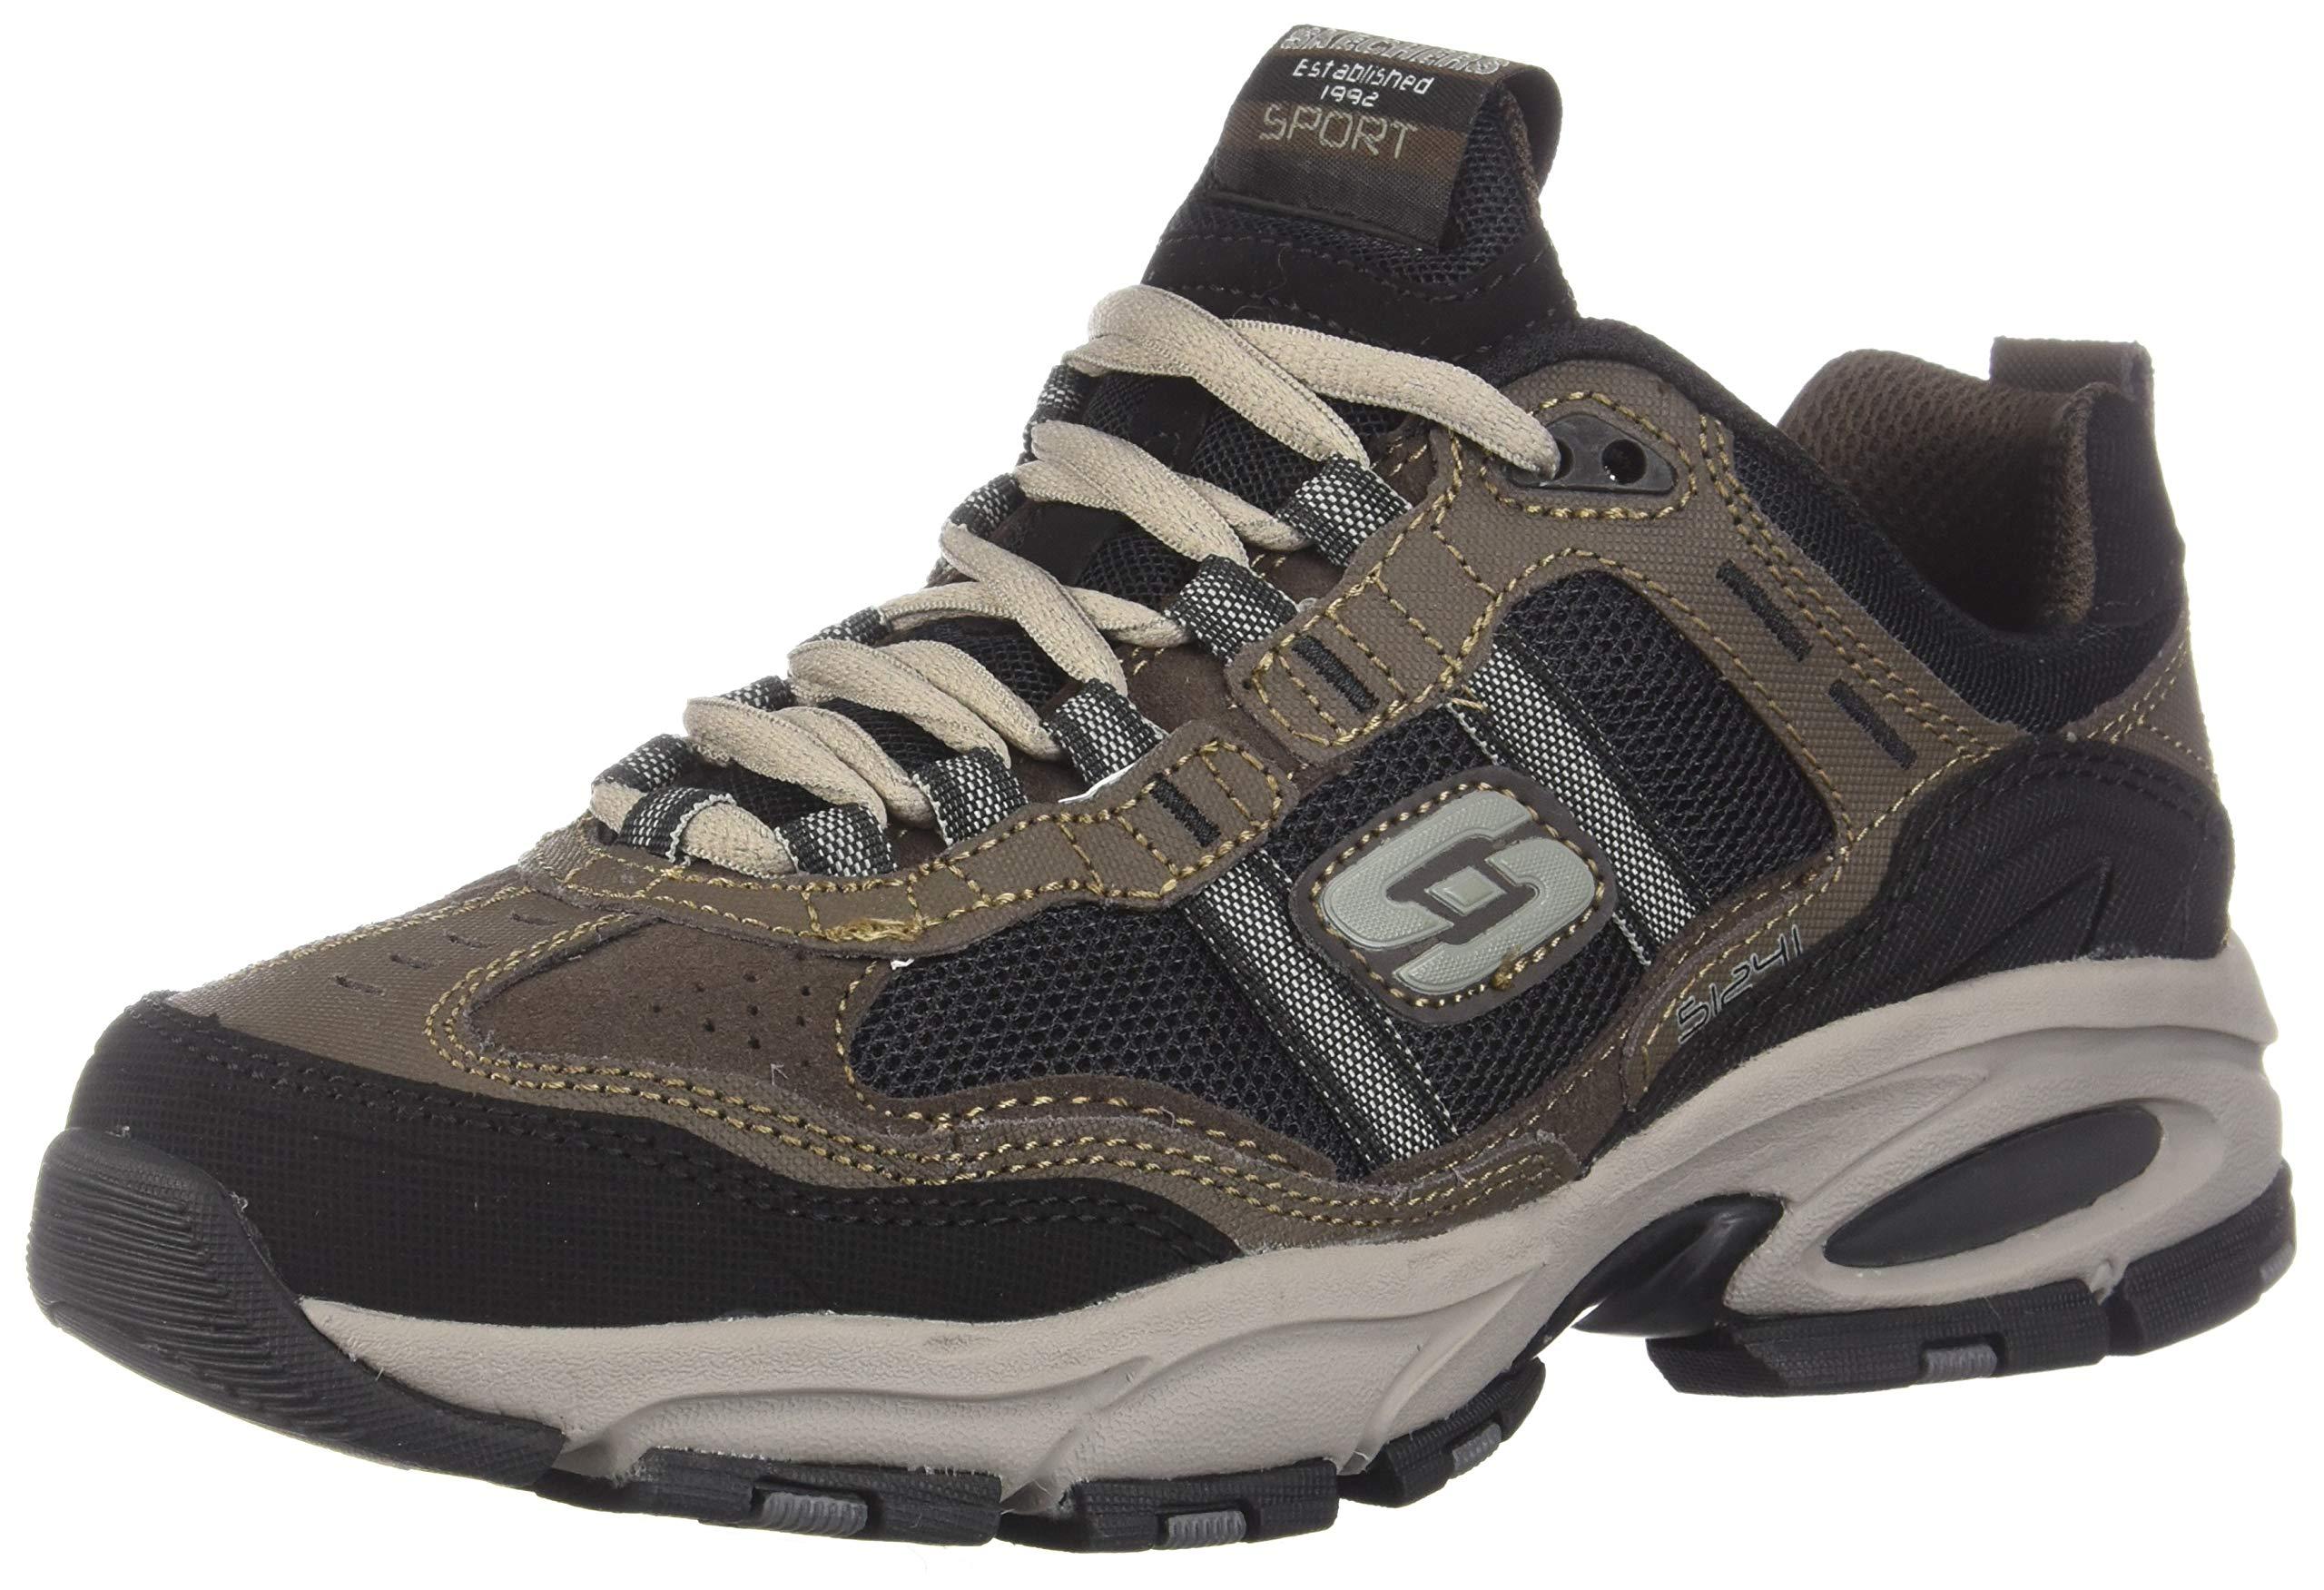 Skechers Sport Men's Vigor 2.0 Trait Memory Foam Sneaker, Brown/Black, 7 M US by Skechers (Image #1)